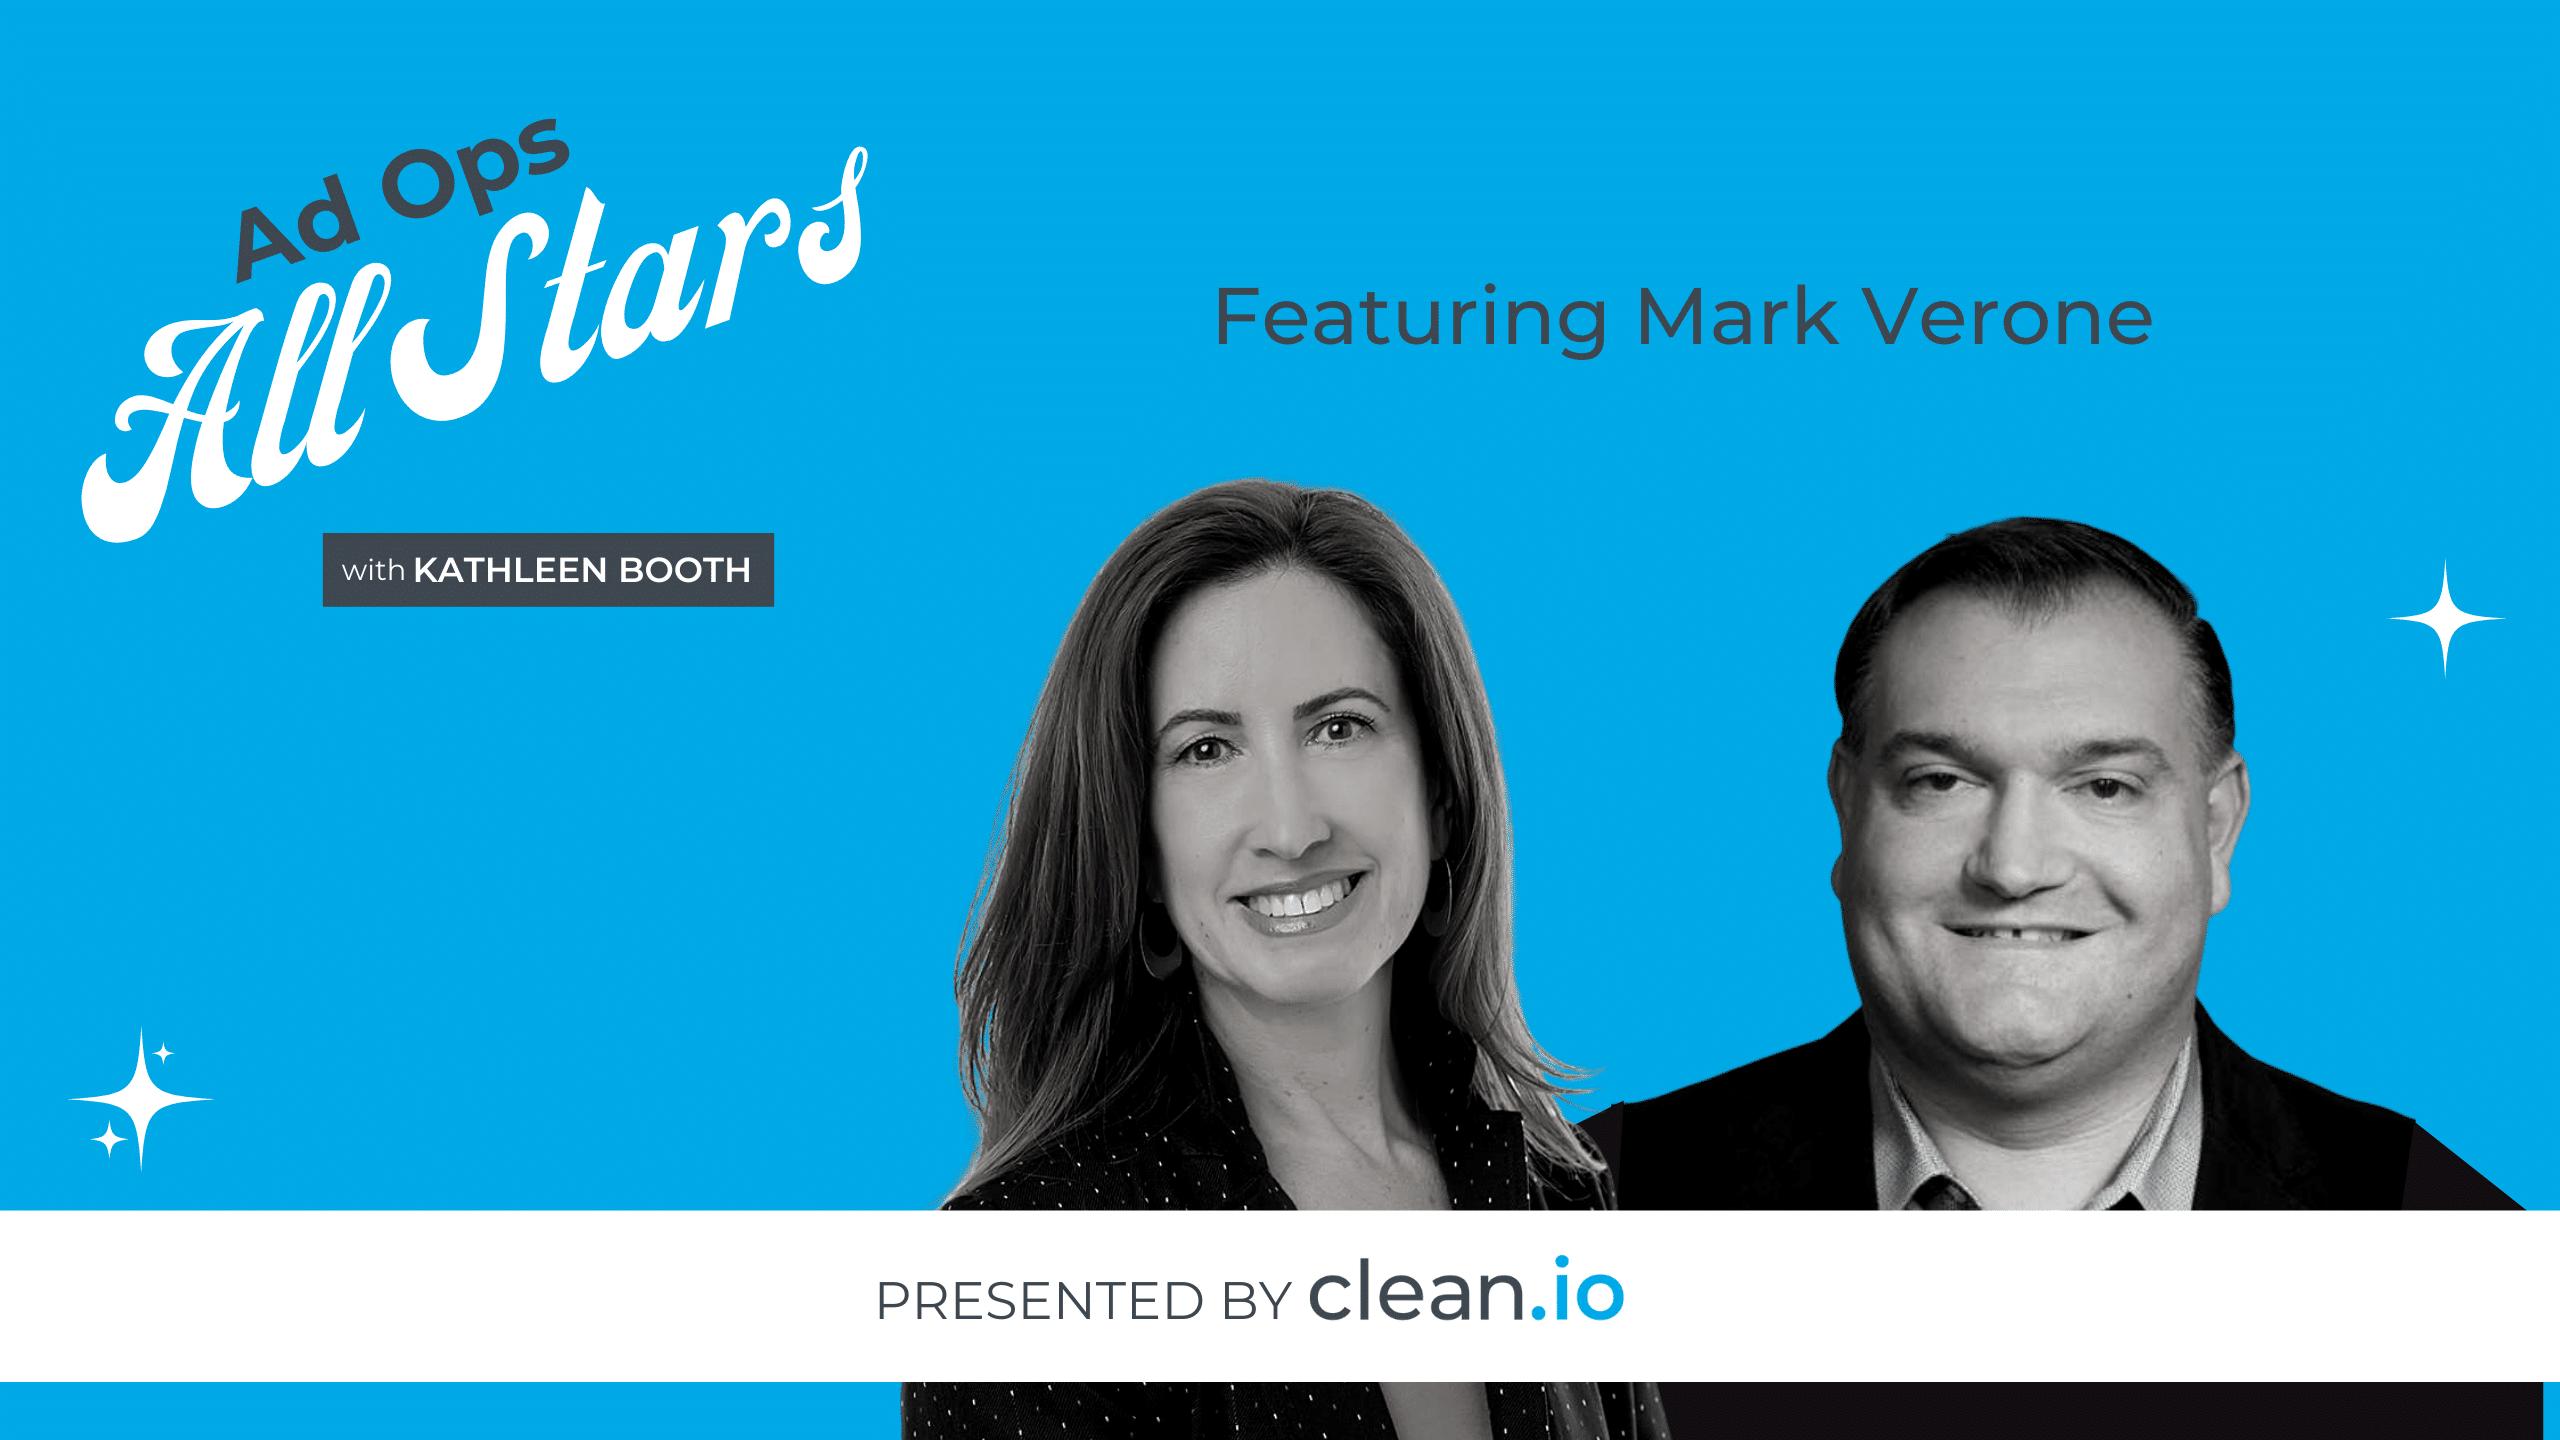 Ad Ops All Stars: Mark Verone